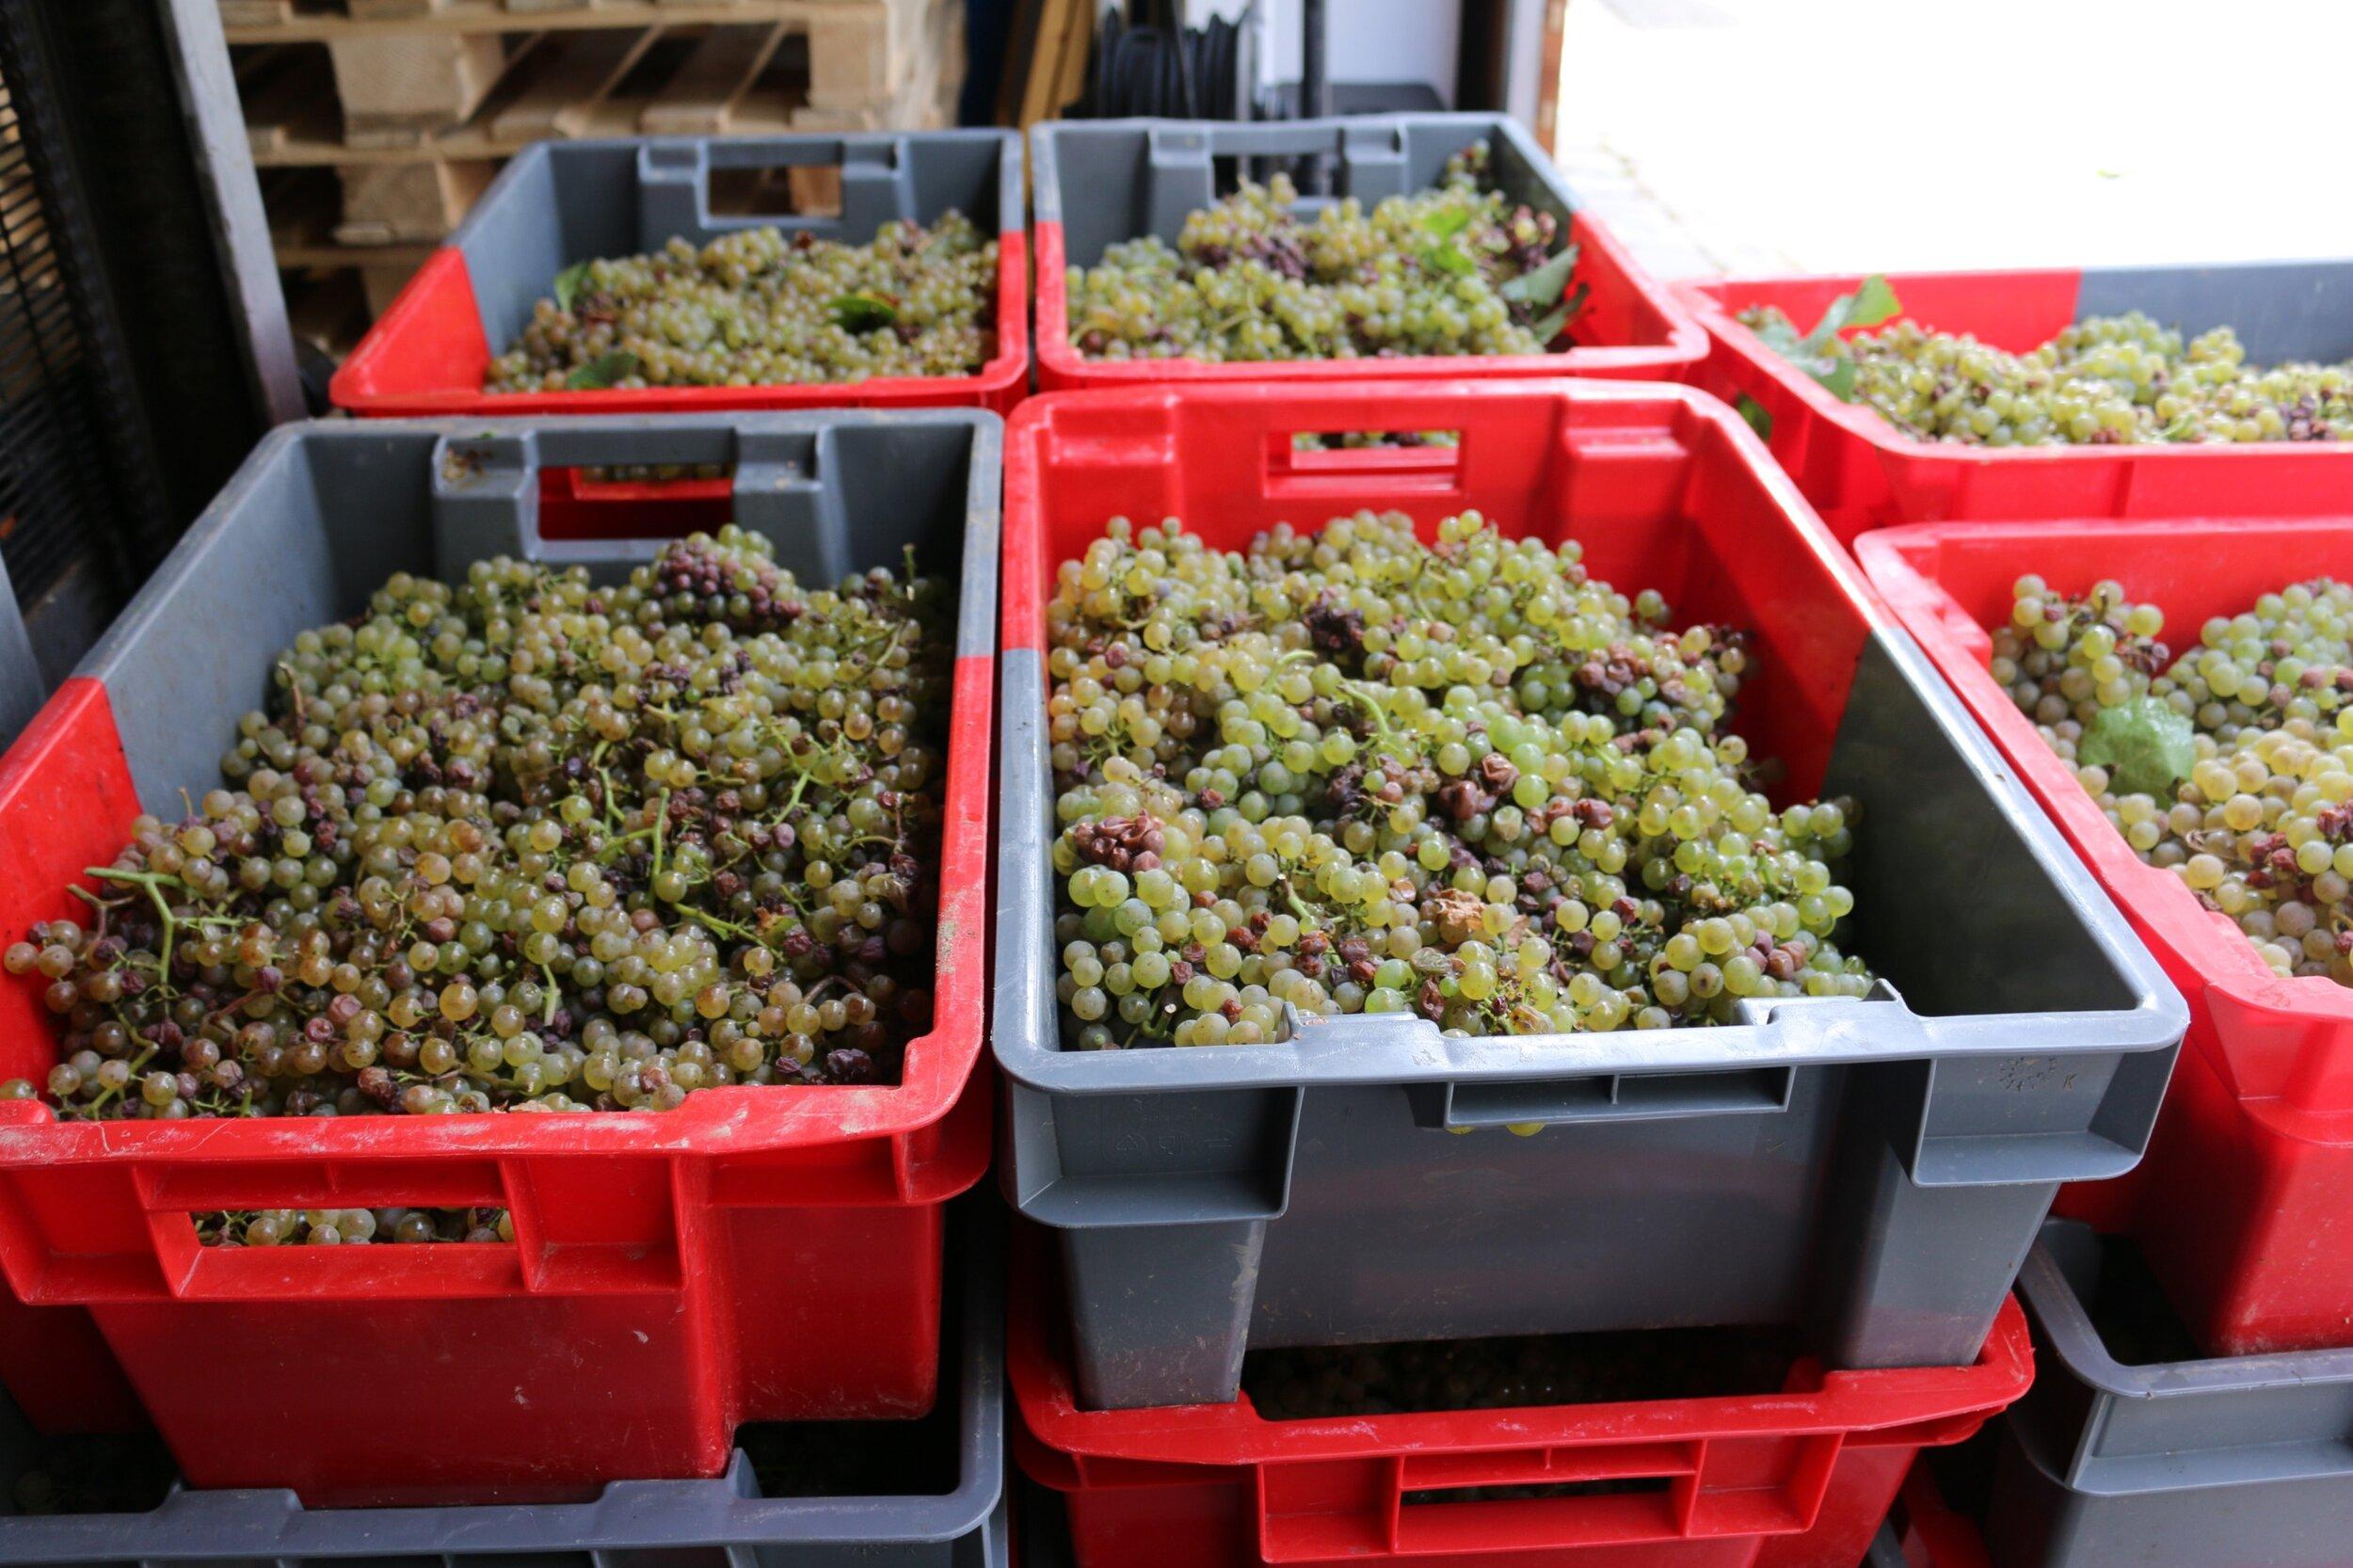 crates grapes.jpg